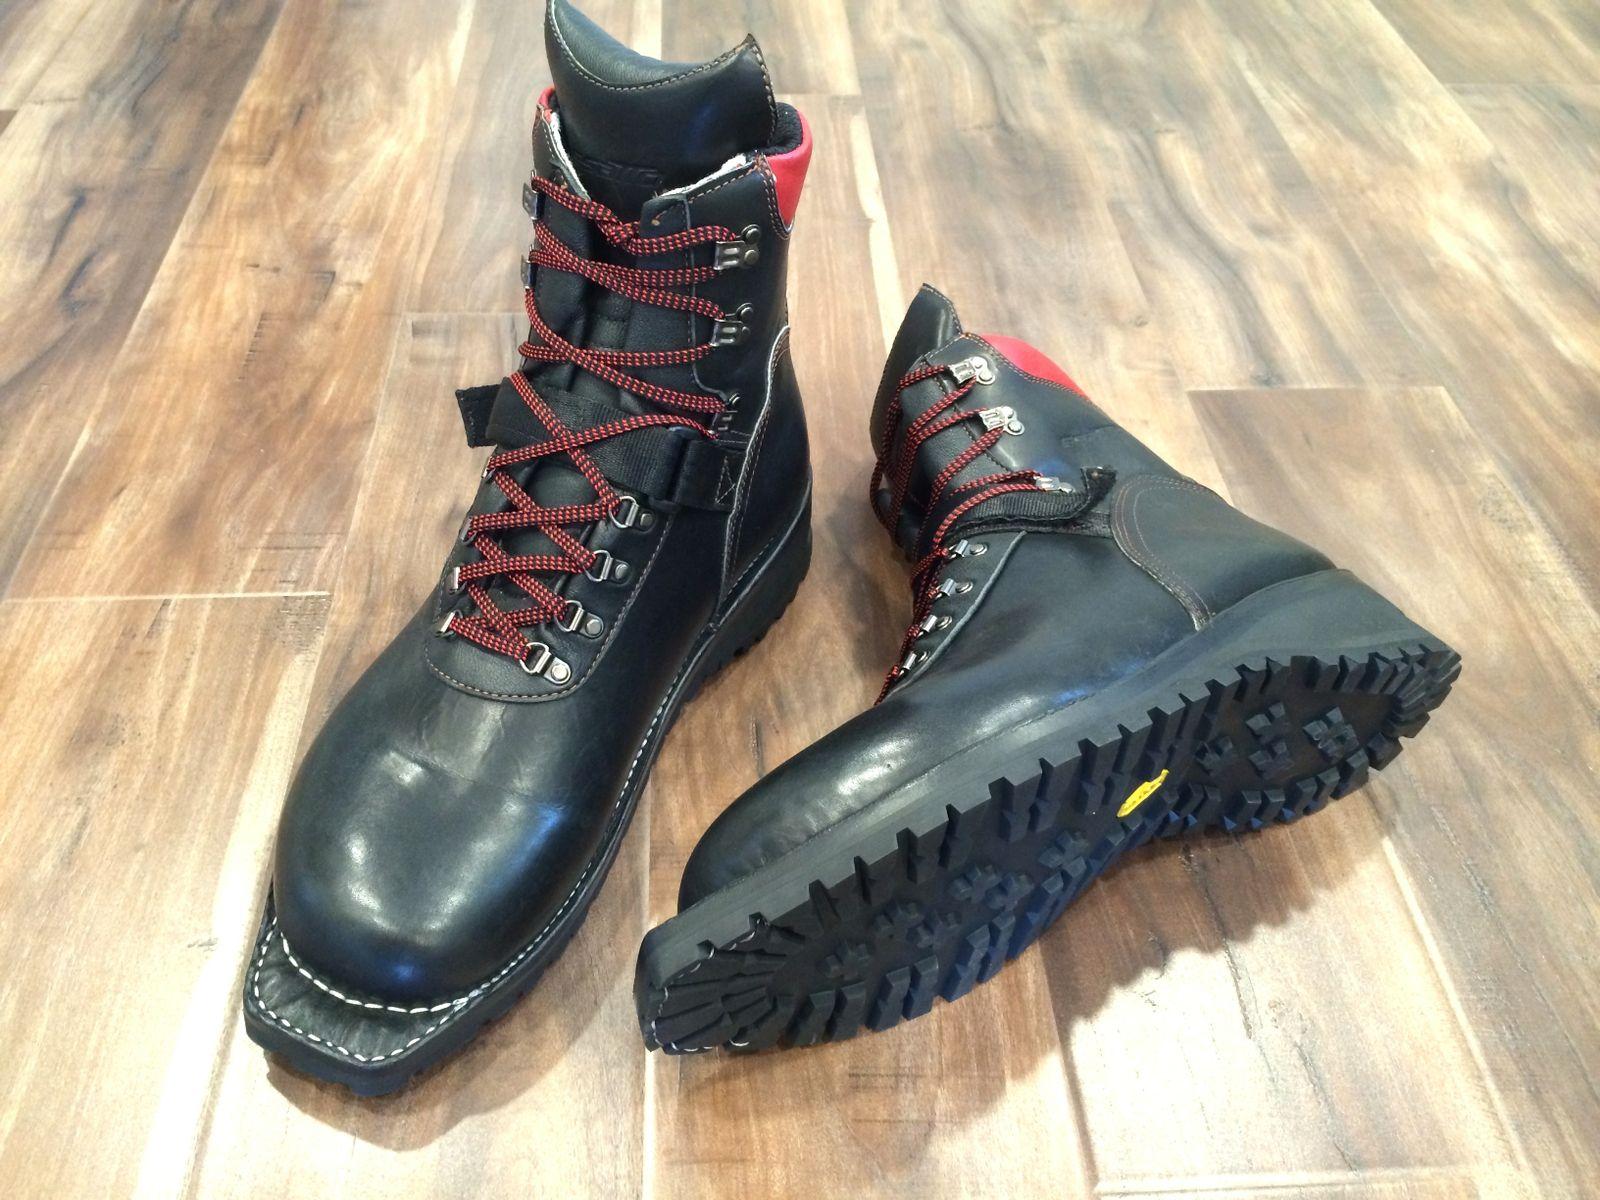 Buy Hand Made Esatto Custom Cross Country Ski Boots, Made